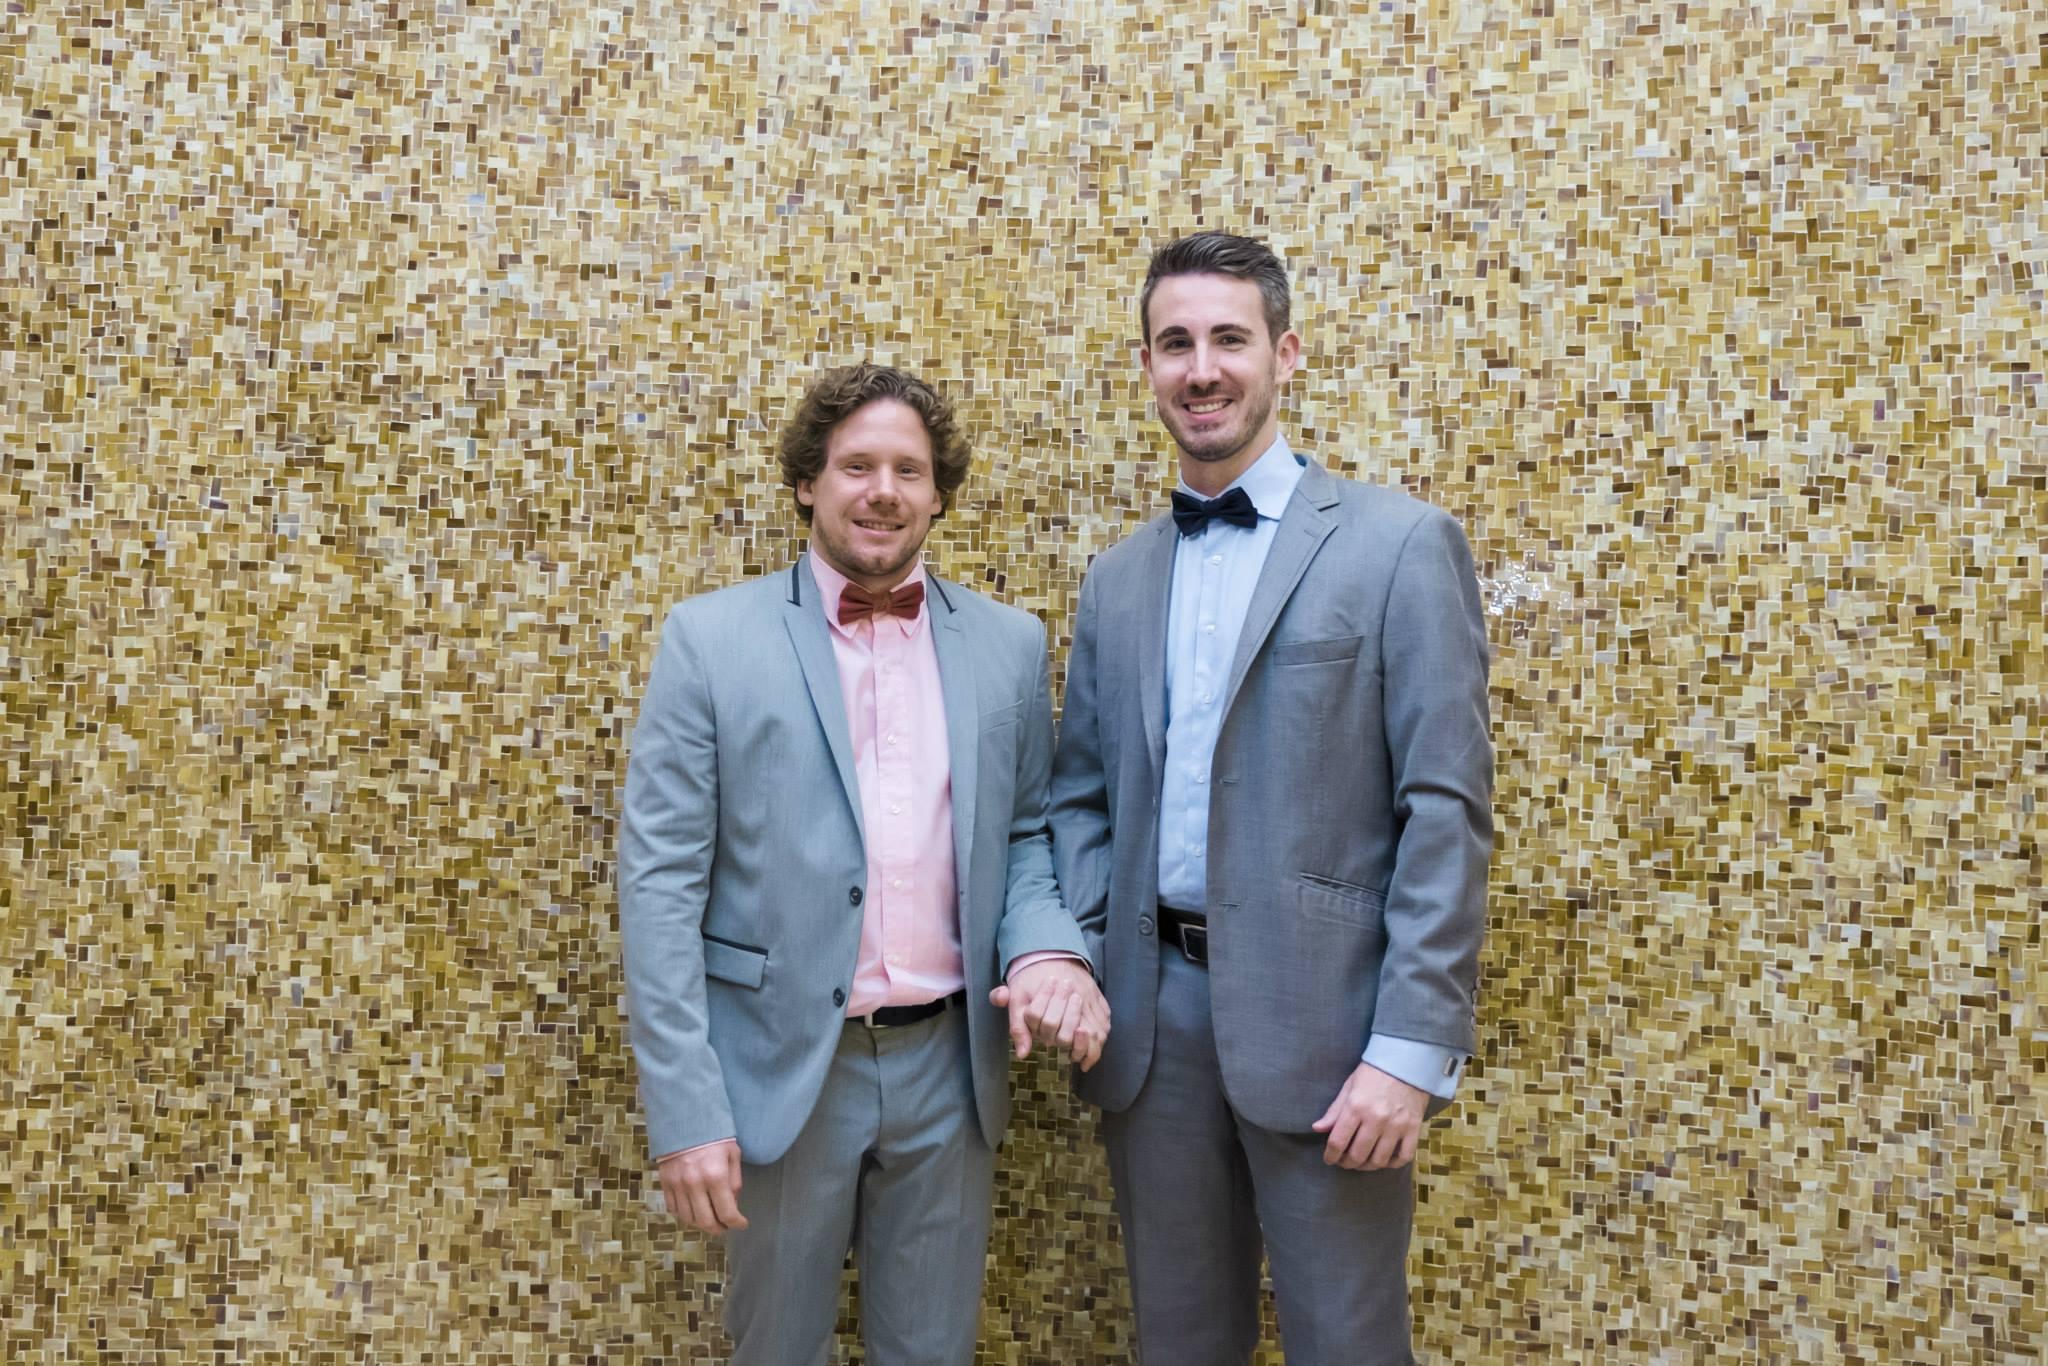 new-york-city-civil-wedding-photo-2.jpg